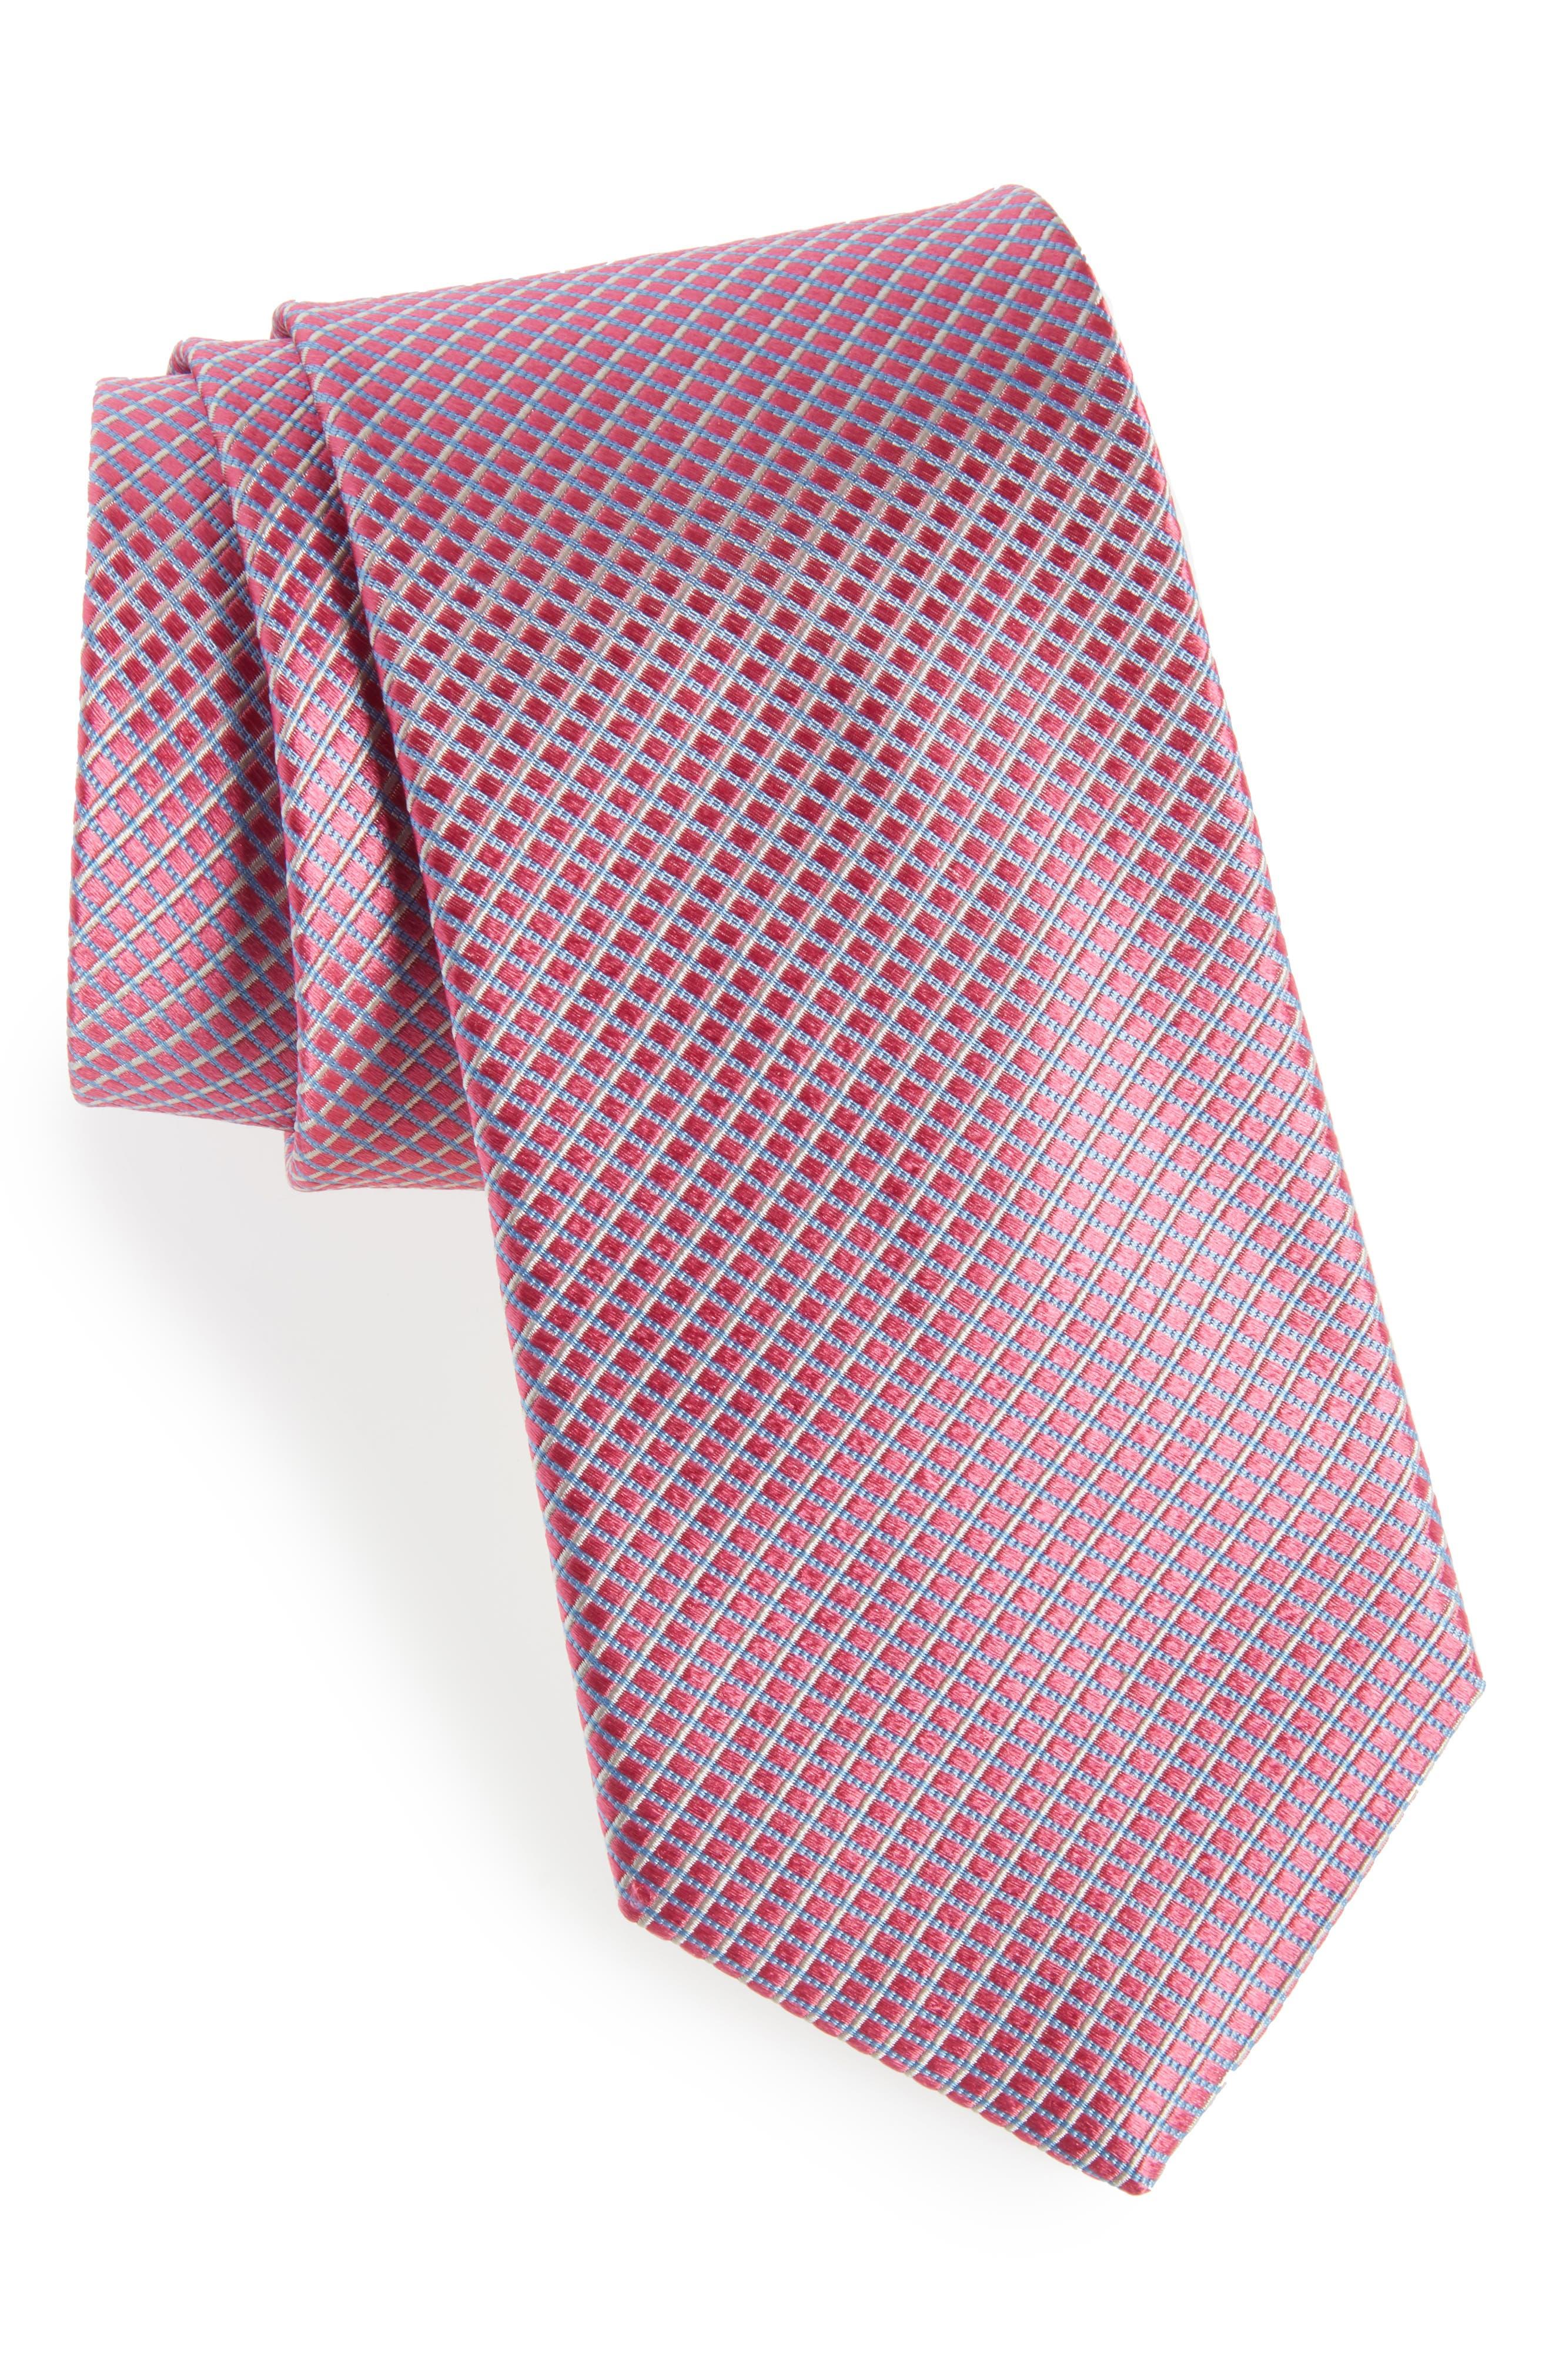 Bucaro Micro Pattern Silk Tie,                         Main,                         color, PINK